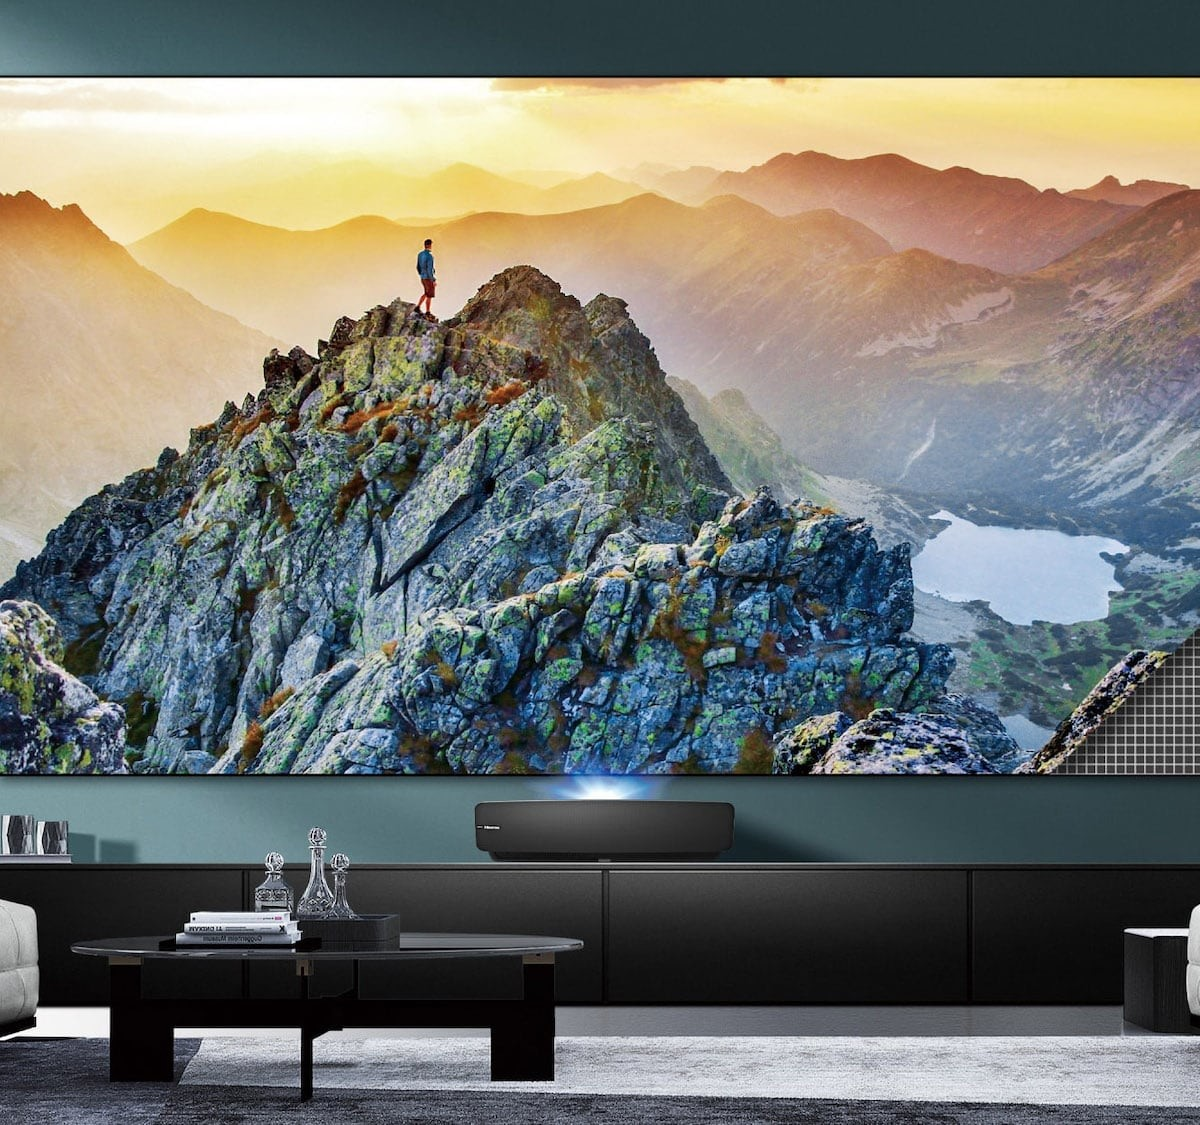 Hisense L5 Series Smart Laser TV boasts a 100″ 4K UHD display